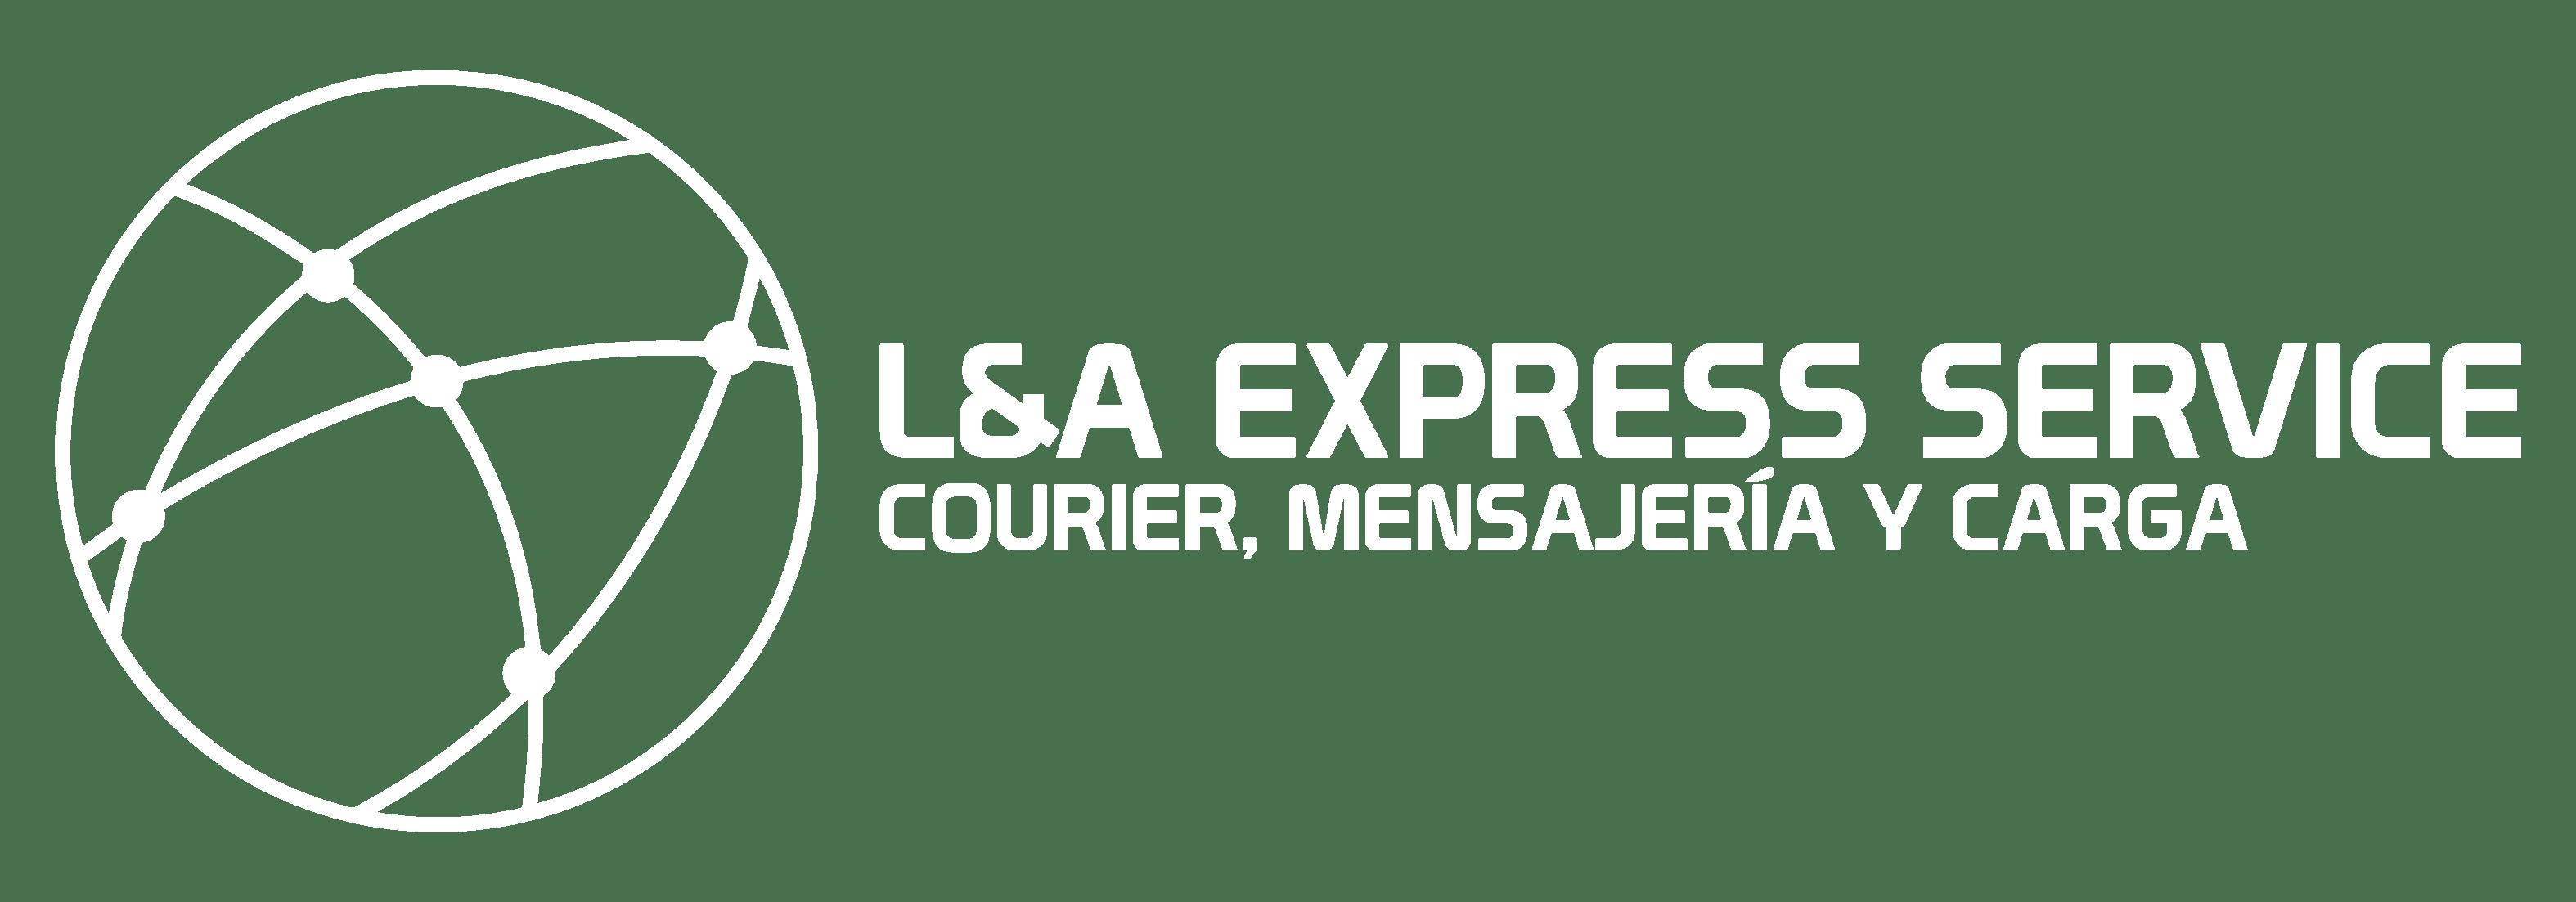 L&A Express